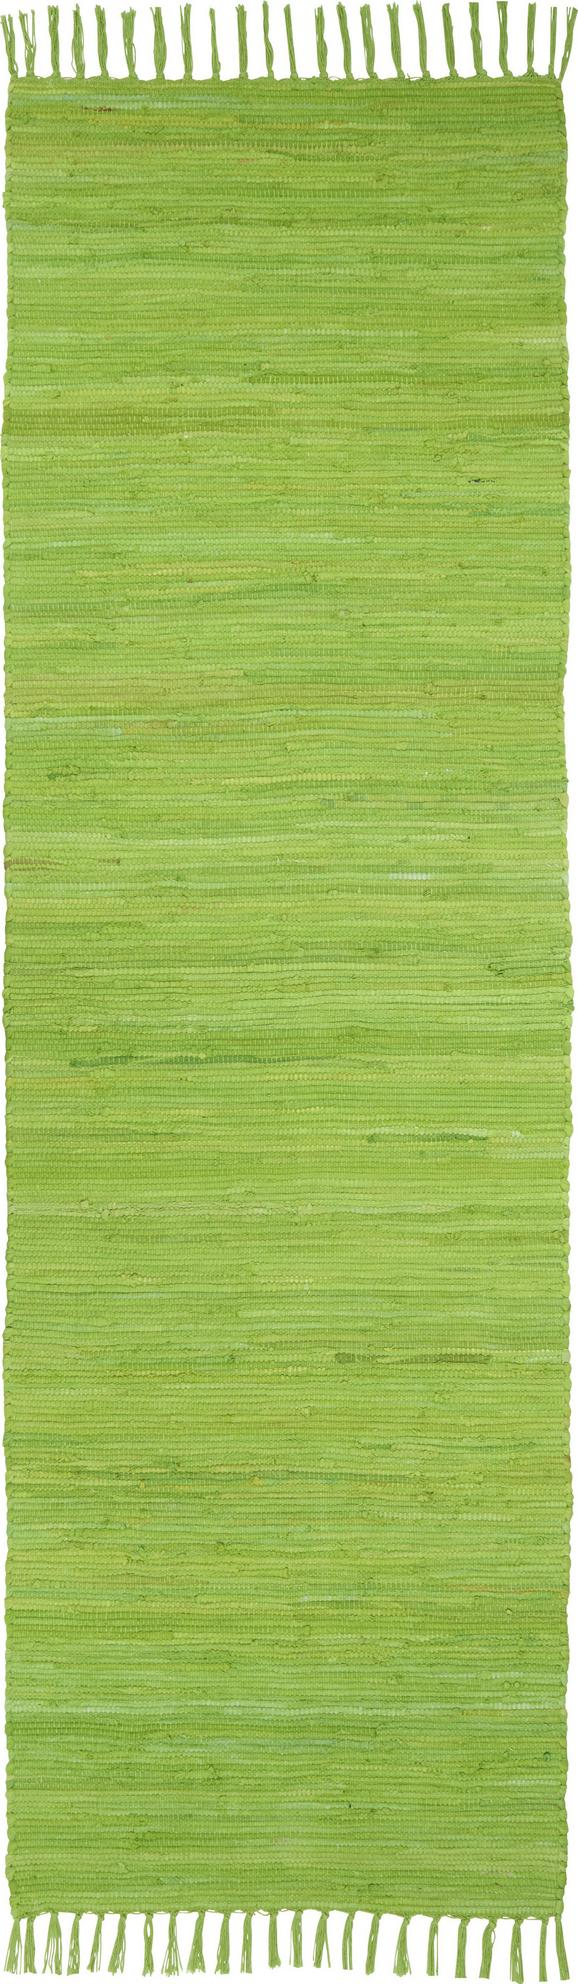 Fleckerlteppich Julia 70x230cm - Hellgrün, KONVENTIONELL, Textil (70/230cm) - Mömax modern living